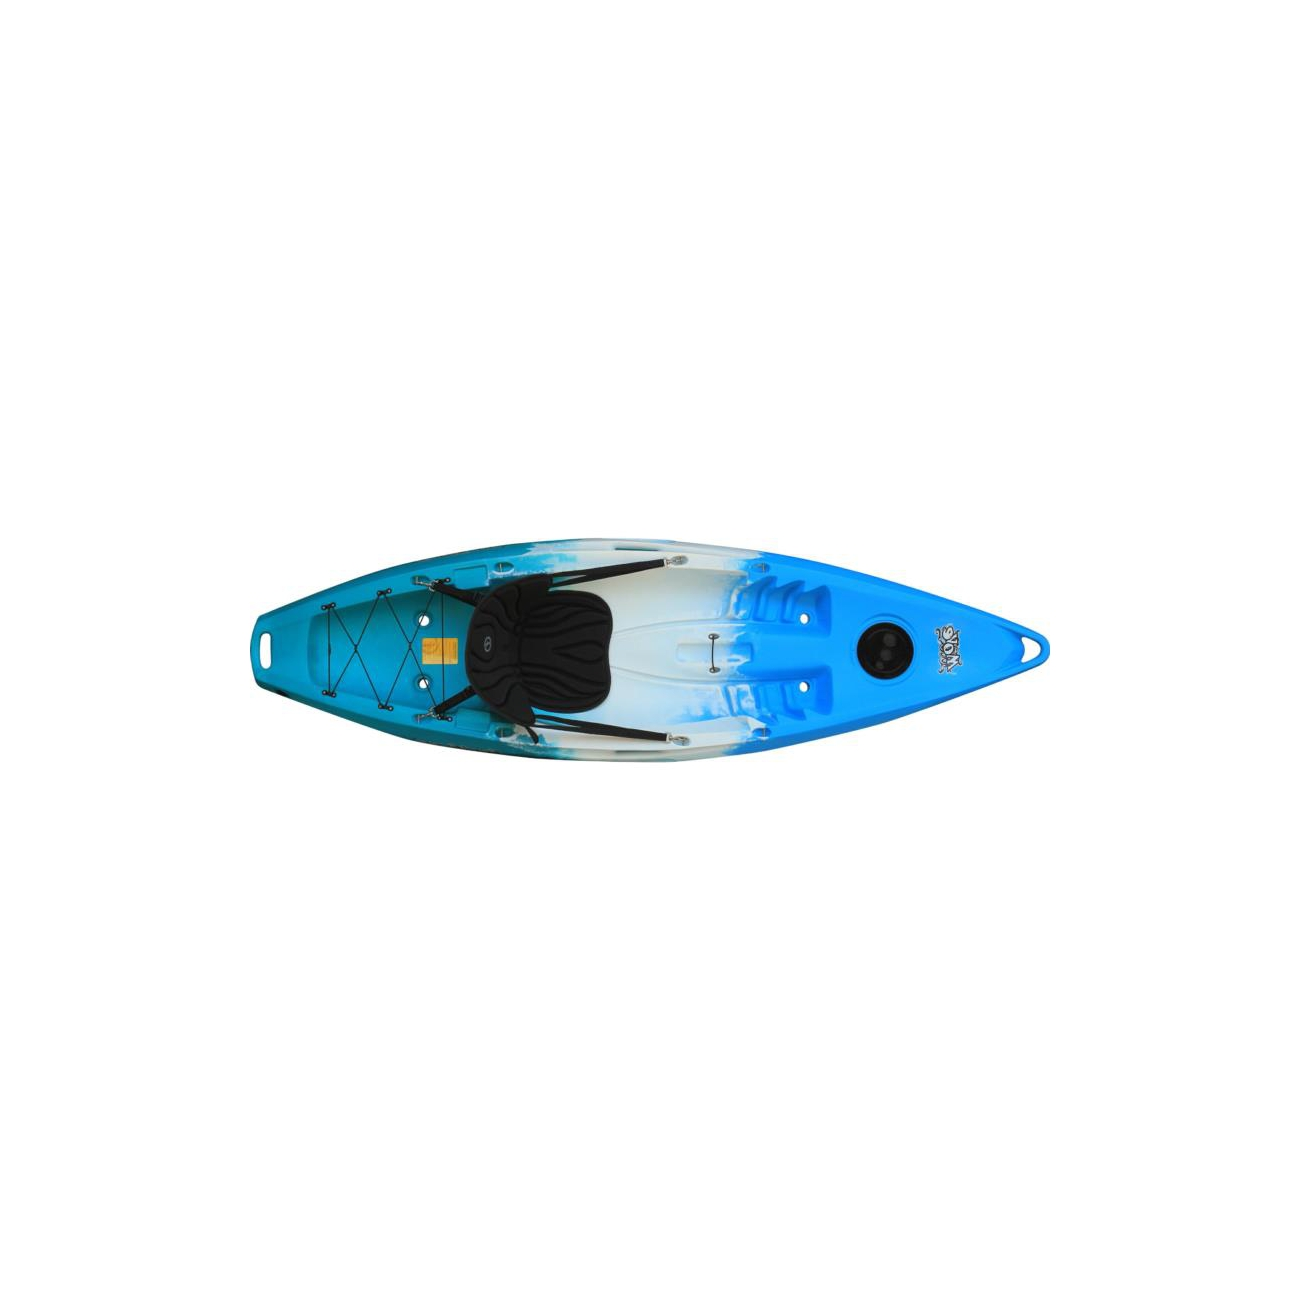 https://feelfreekayak.eu/818-small_default/move-ice-cool-light-blue-white-teal.jpg